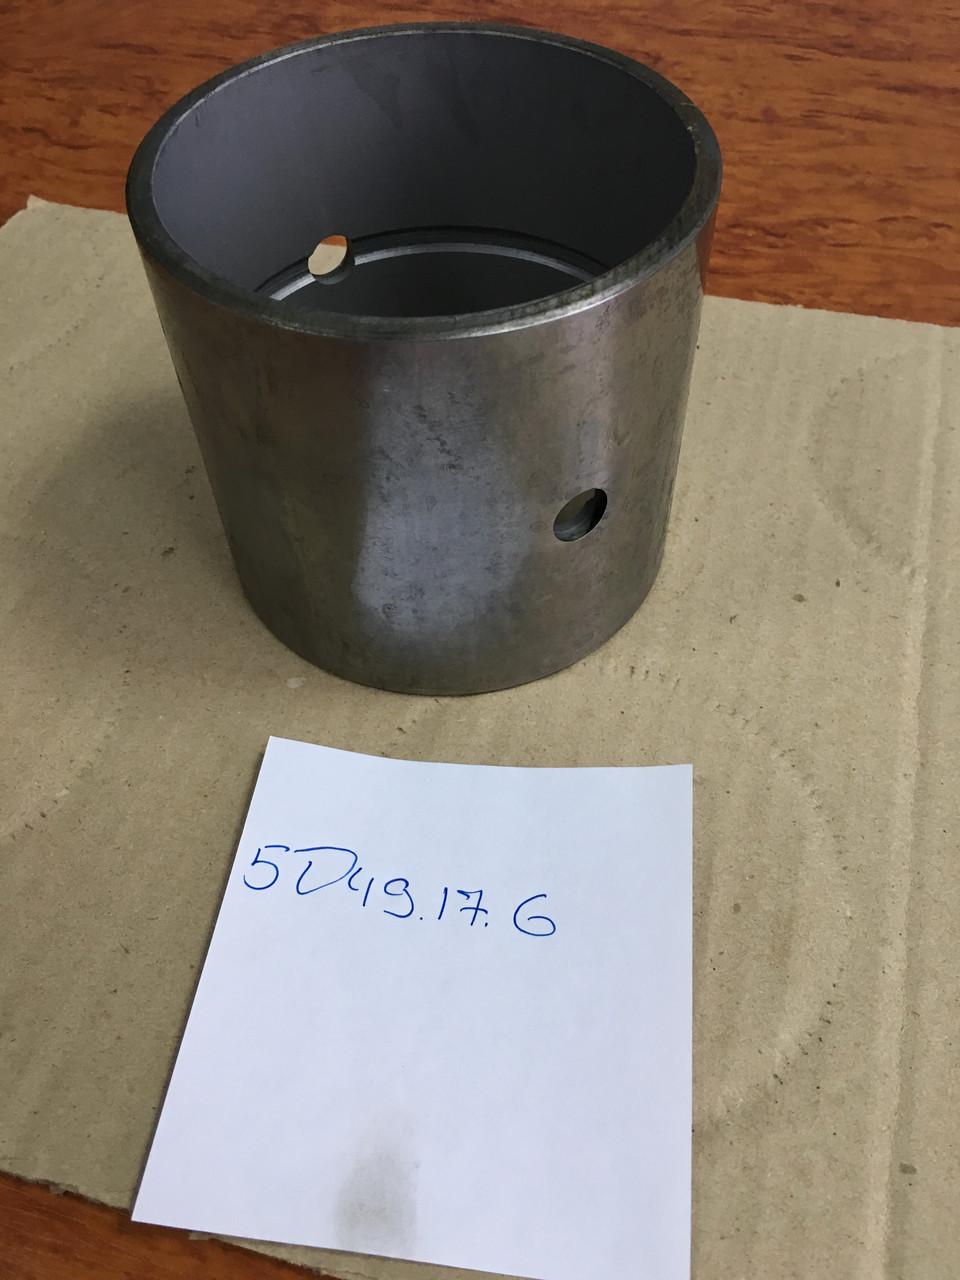 Втулка прицепная  5Д49.17.6 СБ